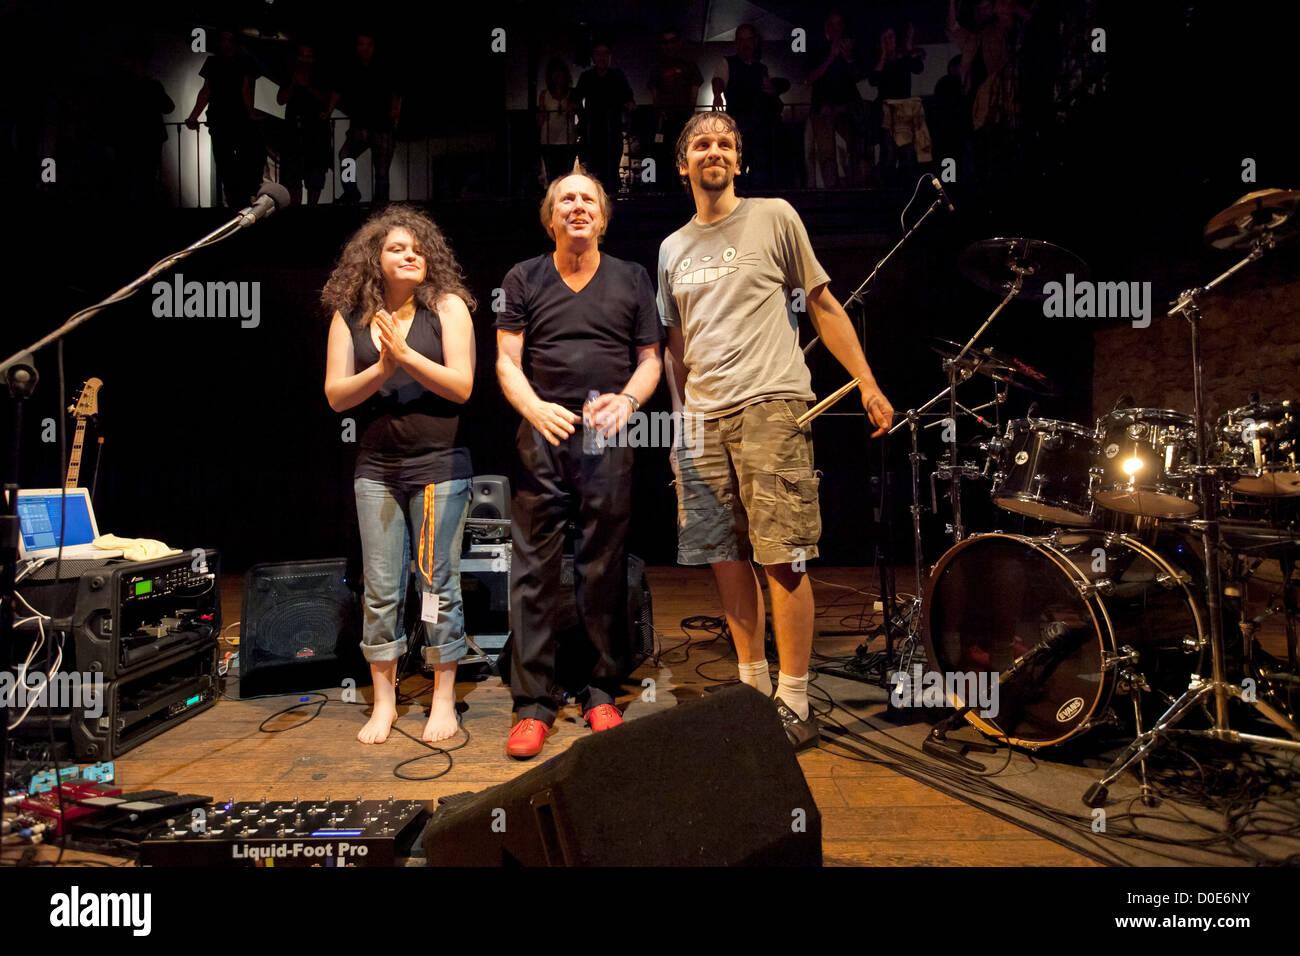 Julie Slick, Adrian Belew and Marco Minneman Adrian Belew performs ...